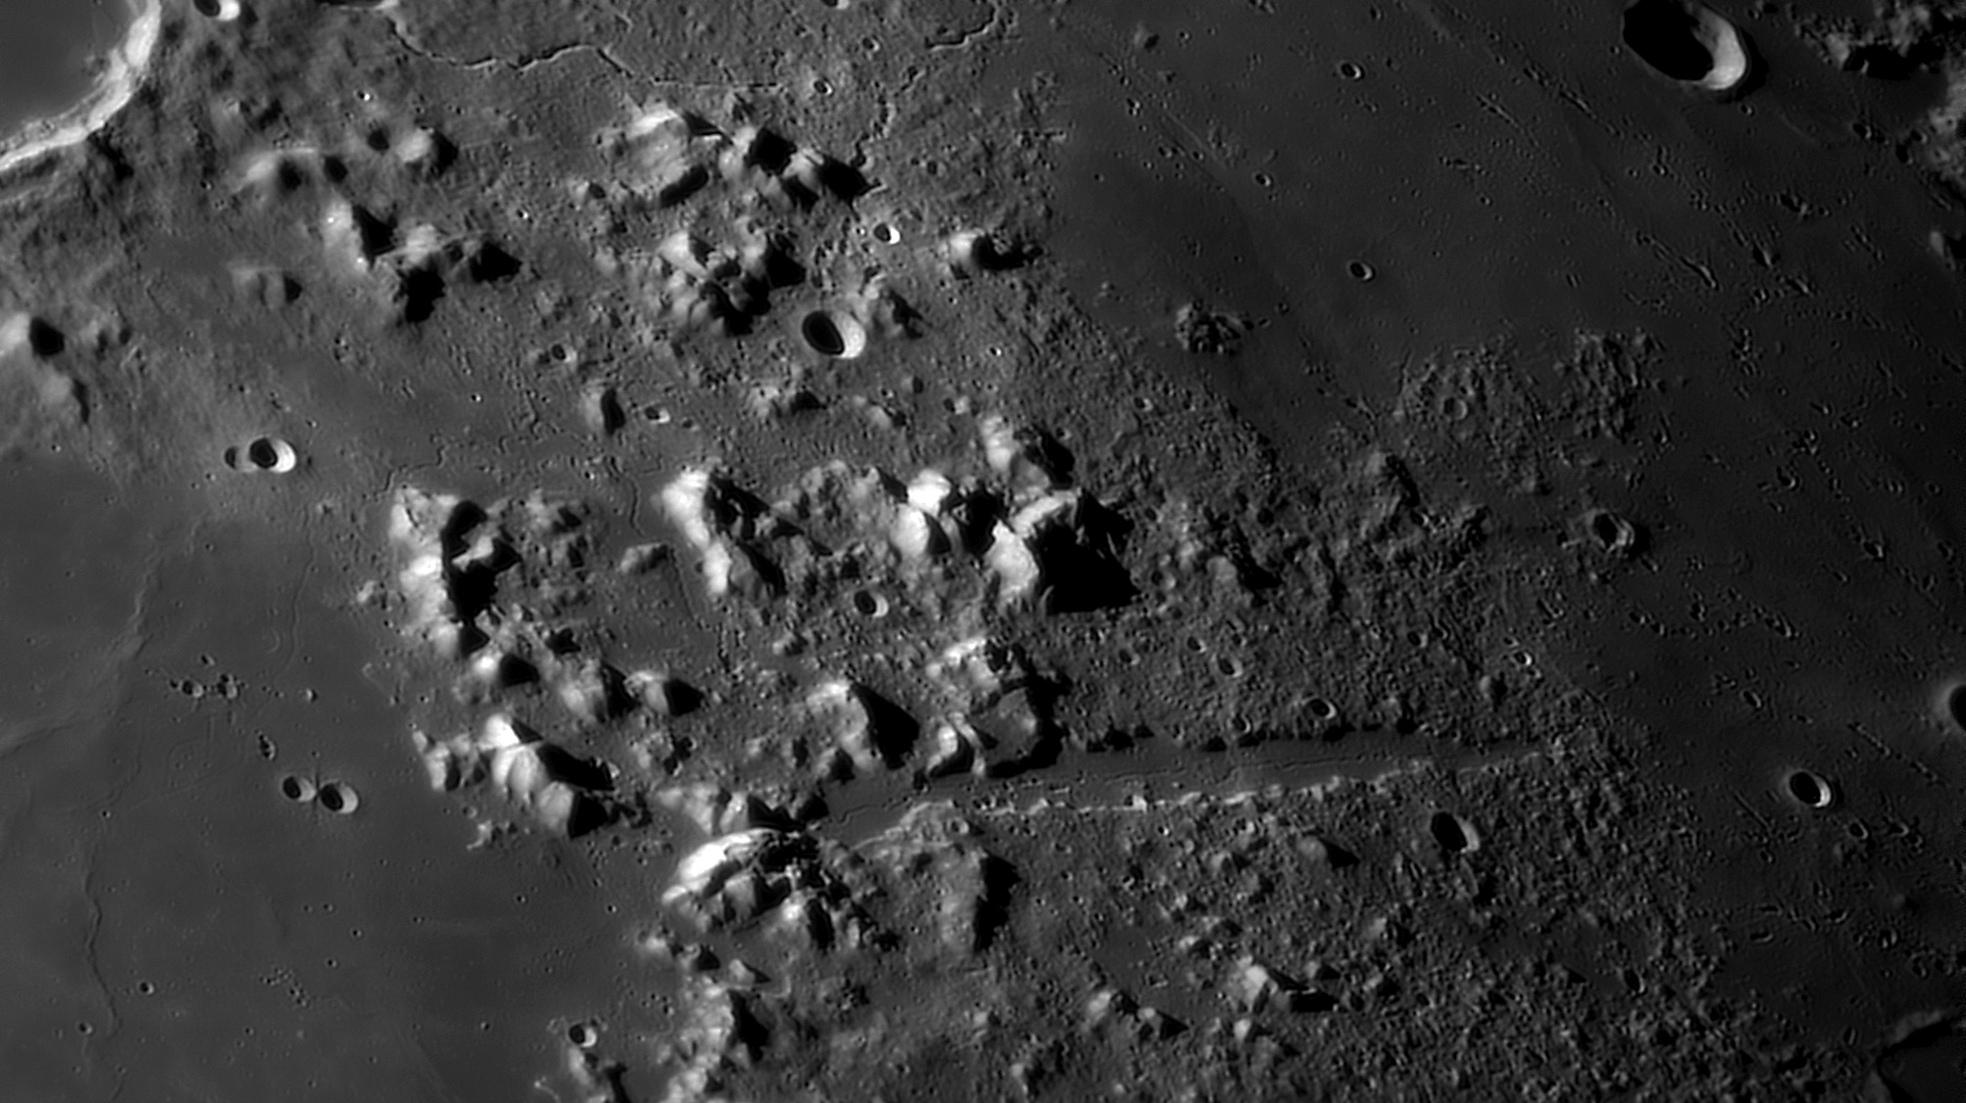 large.moon_20_09_2019_PLATON-TRAI.jpg.0ecbd9dafb30756f7a85d187b84a10a2.jpg